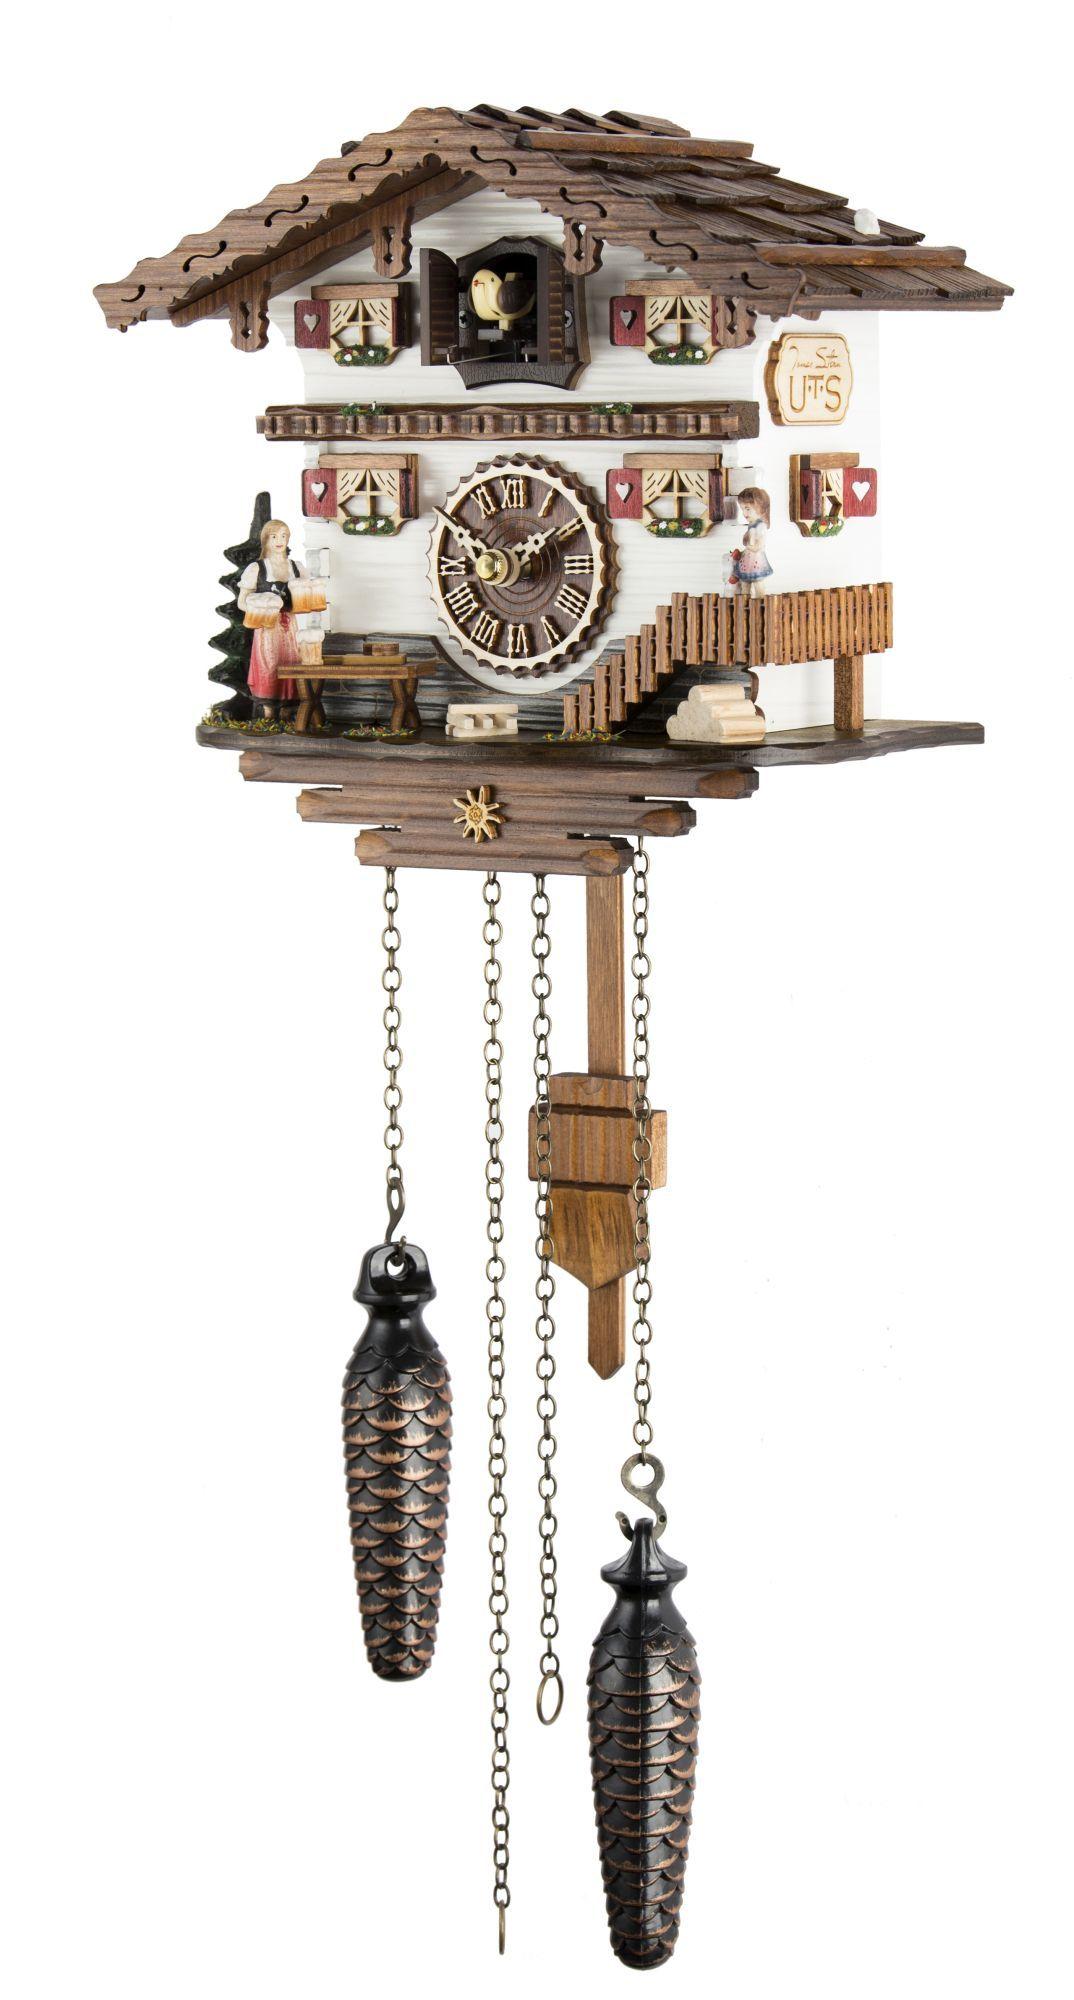 Часы настенные Часы настенные с кукушкой Tomas Stern 5025 chasy-nastennye-s-kukushkoy-tomas-stern-5025-germaniya.jpg